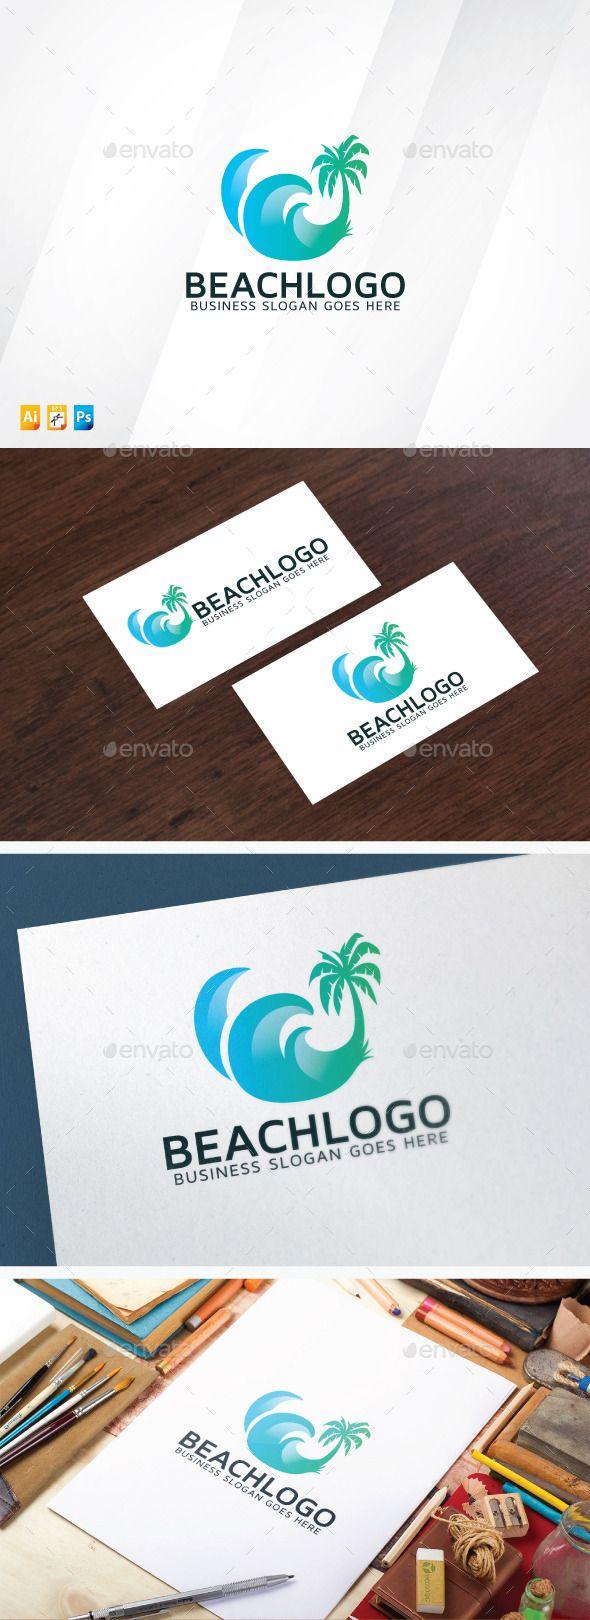 Beach - Logo Design Template Vector #logotype Download it here: http://graphicriver.net/item/beach-logo/12754488?s_rank=520?ref=nexion